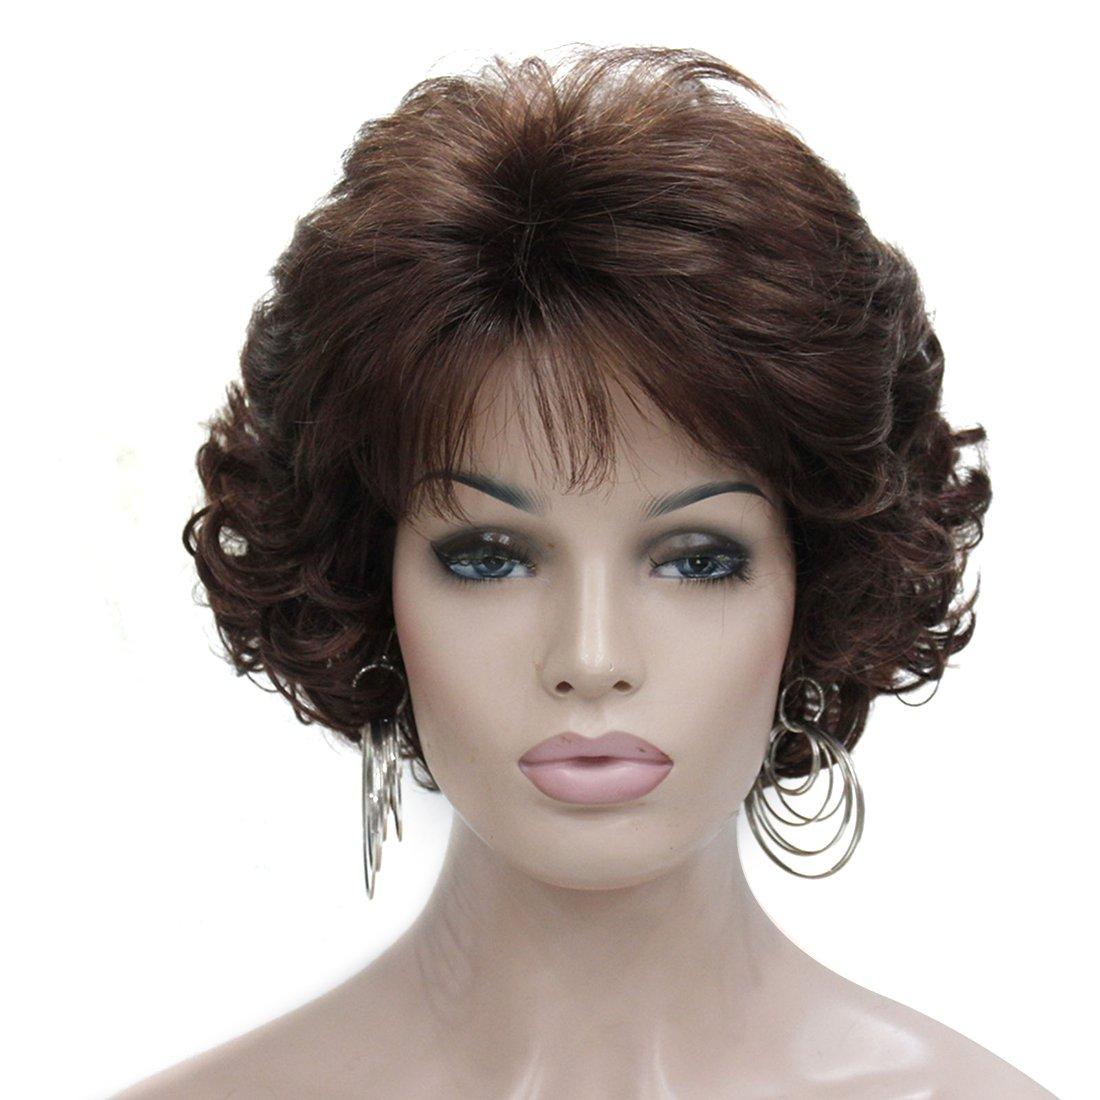 Amazon.com : Wiginway Curly Wavy Wig Synthetic Hairpiece